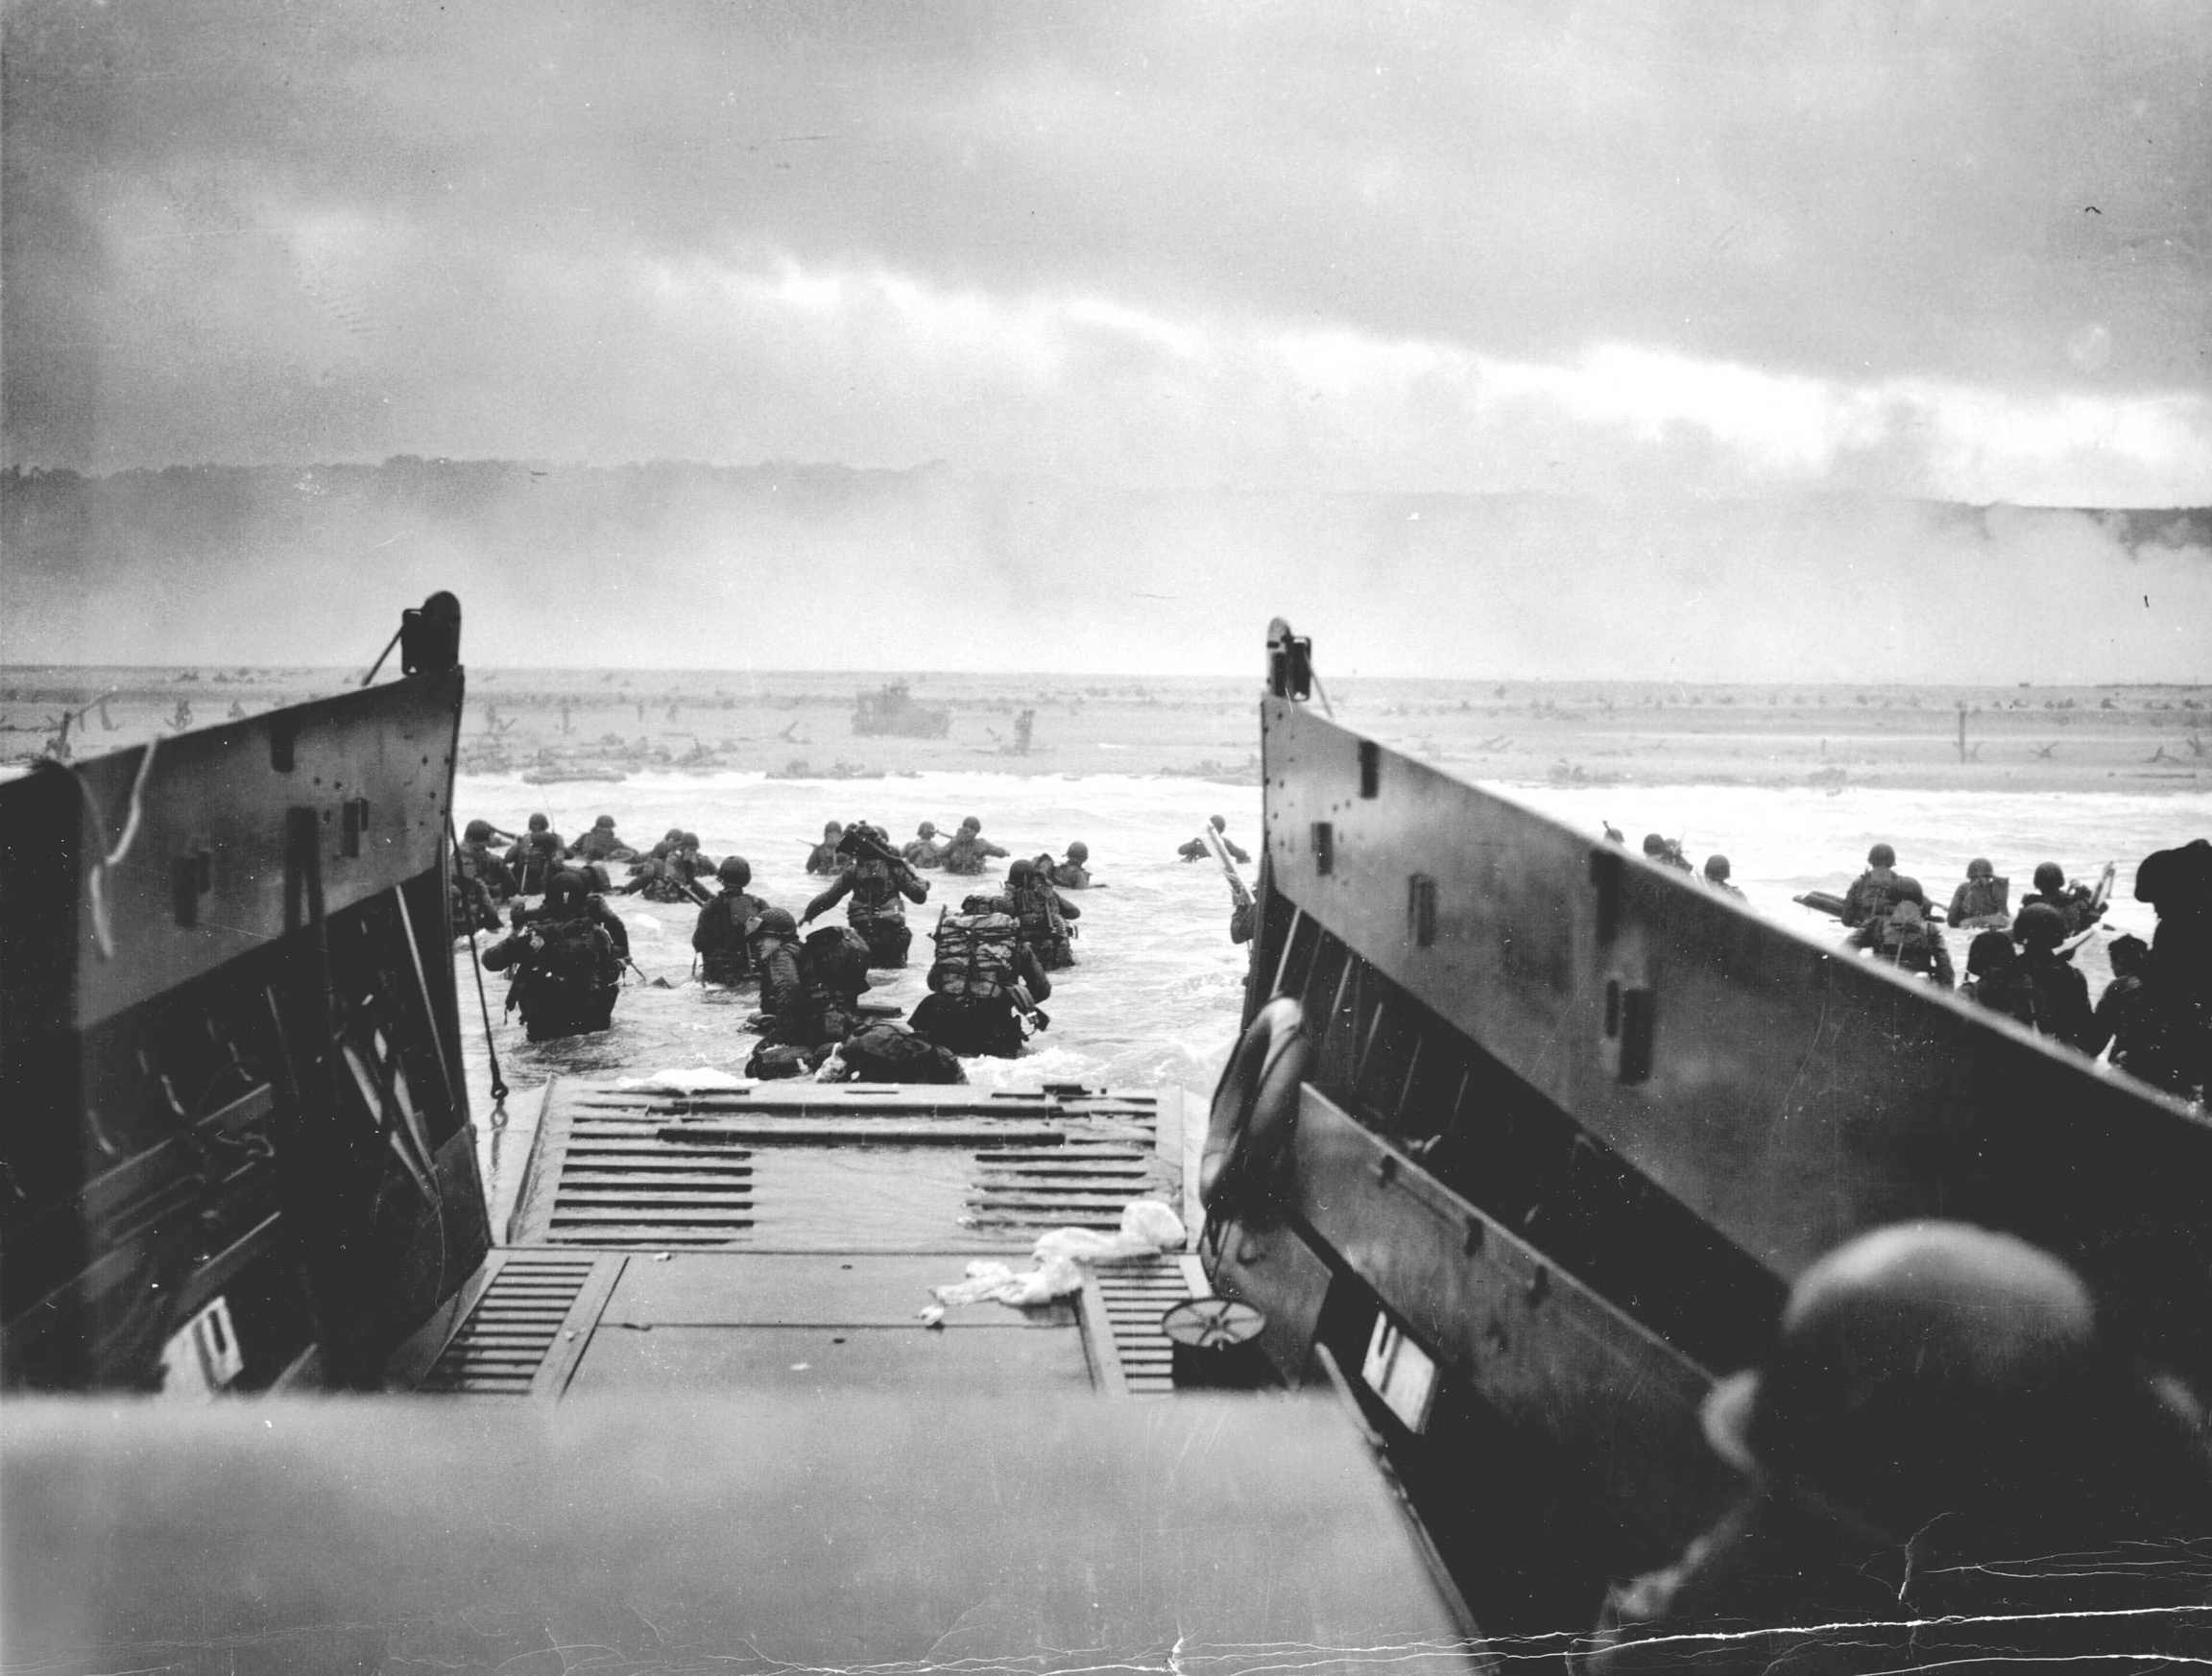 landing on Omaha beach in france for d-day